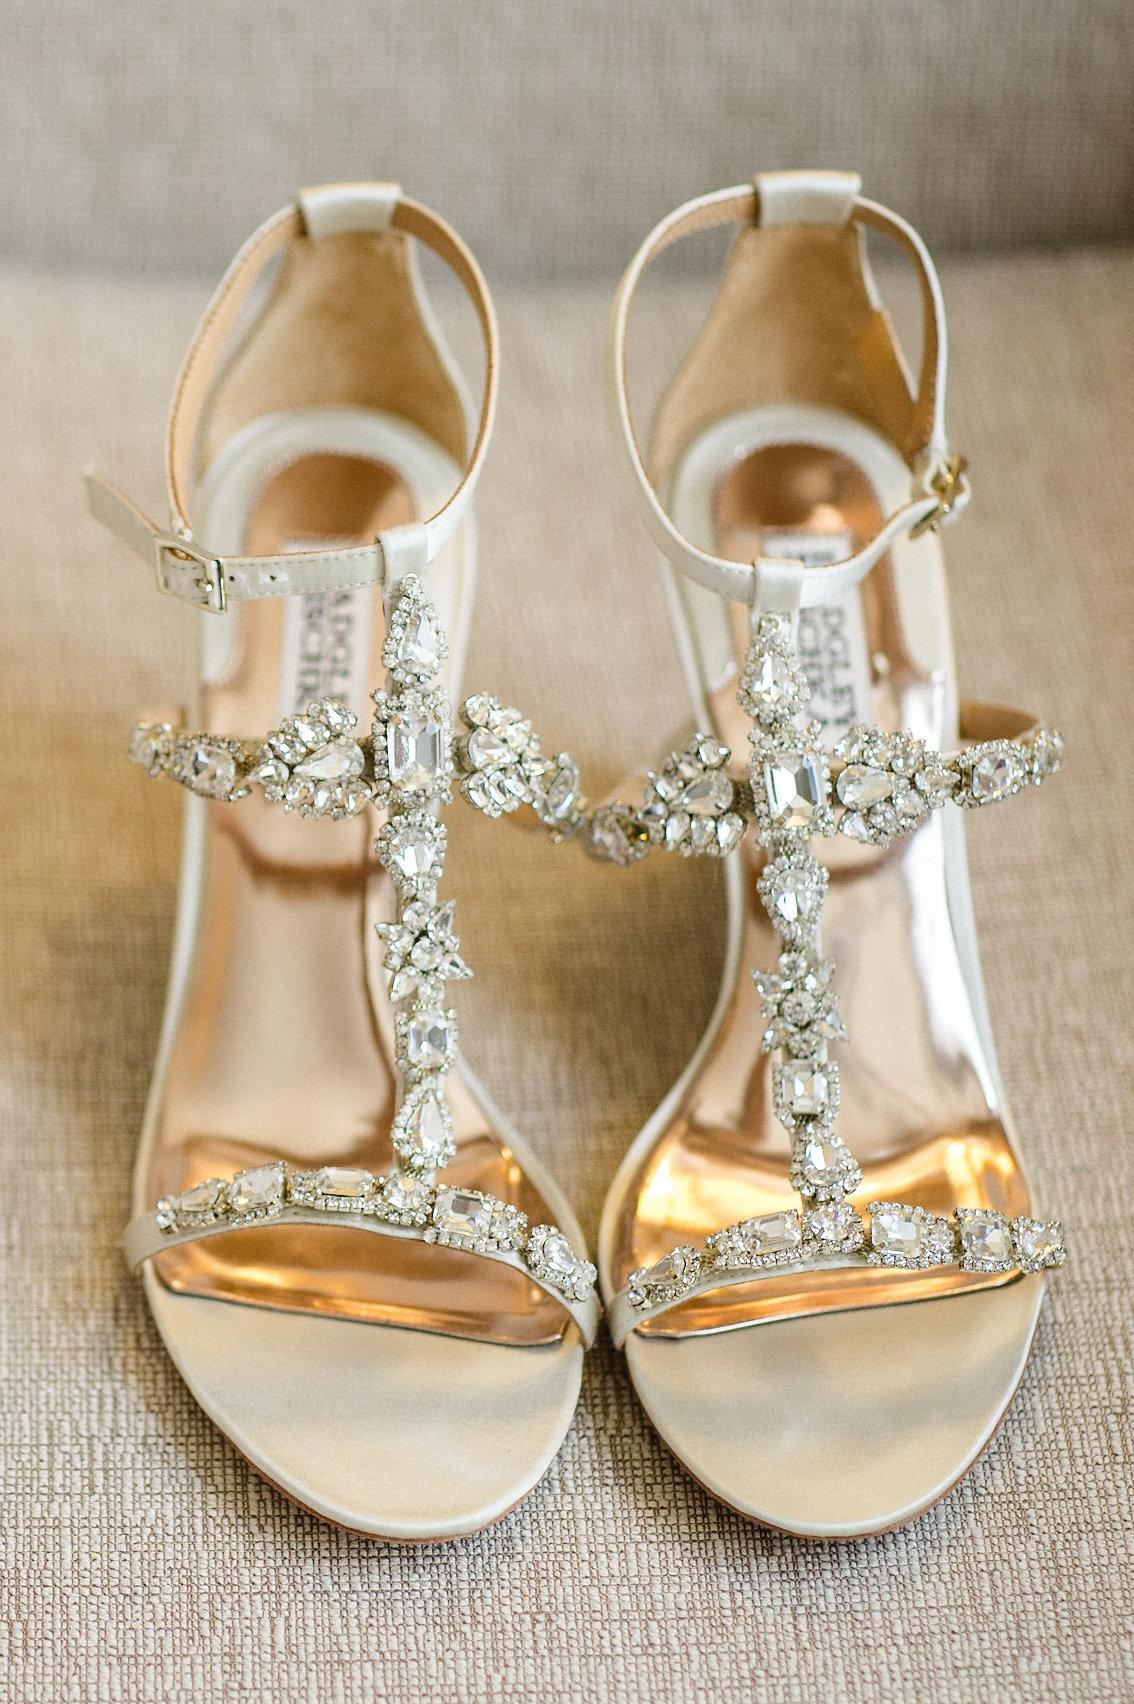 shelby&jordan|smitten&hooked|wedding|details-017.jpg